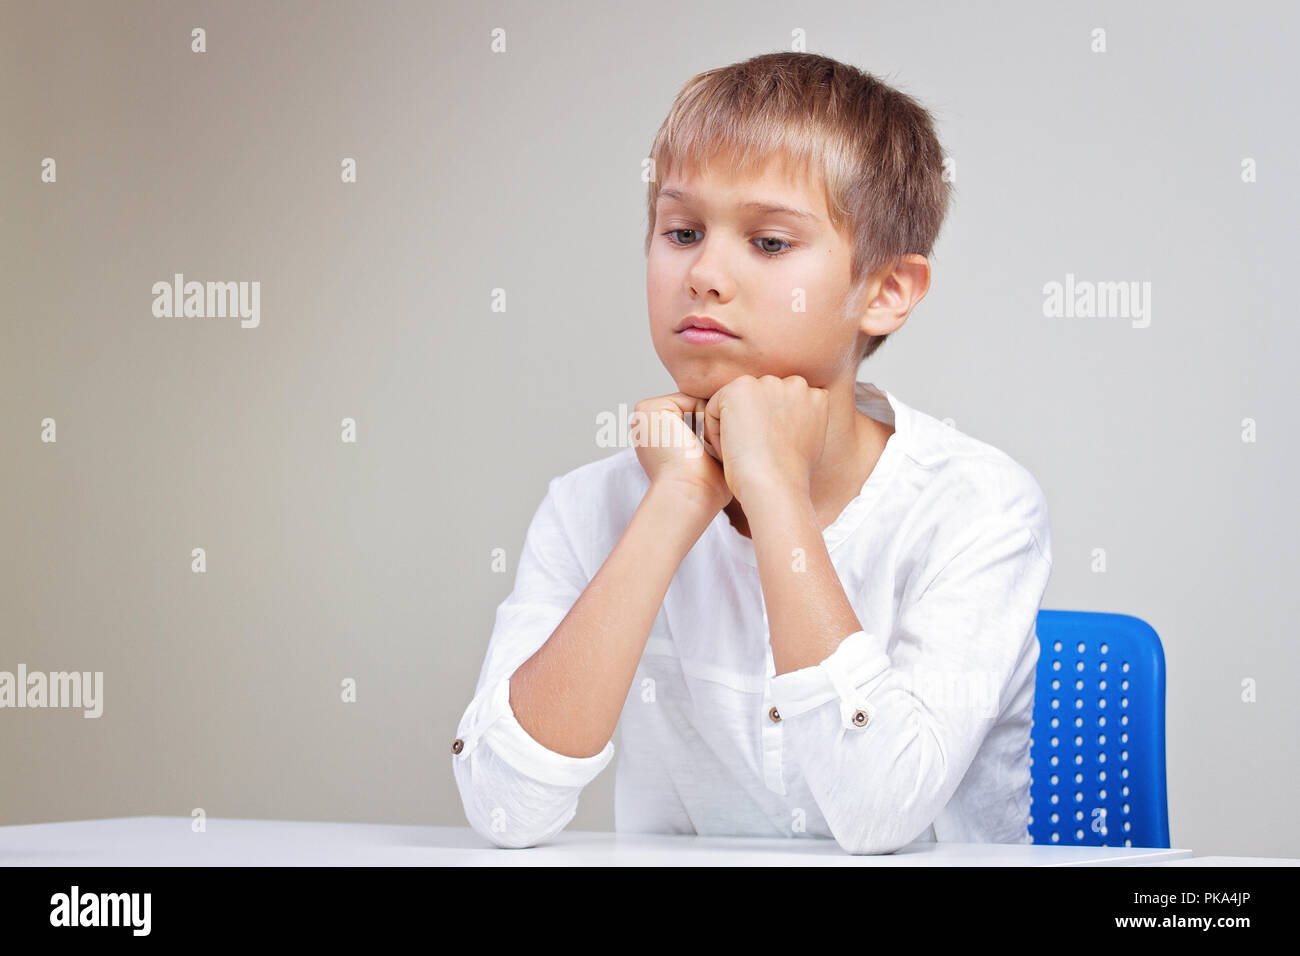 Thinking schoolchild sitting at empty white desk - Stock Image